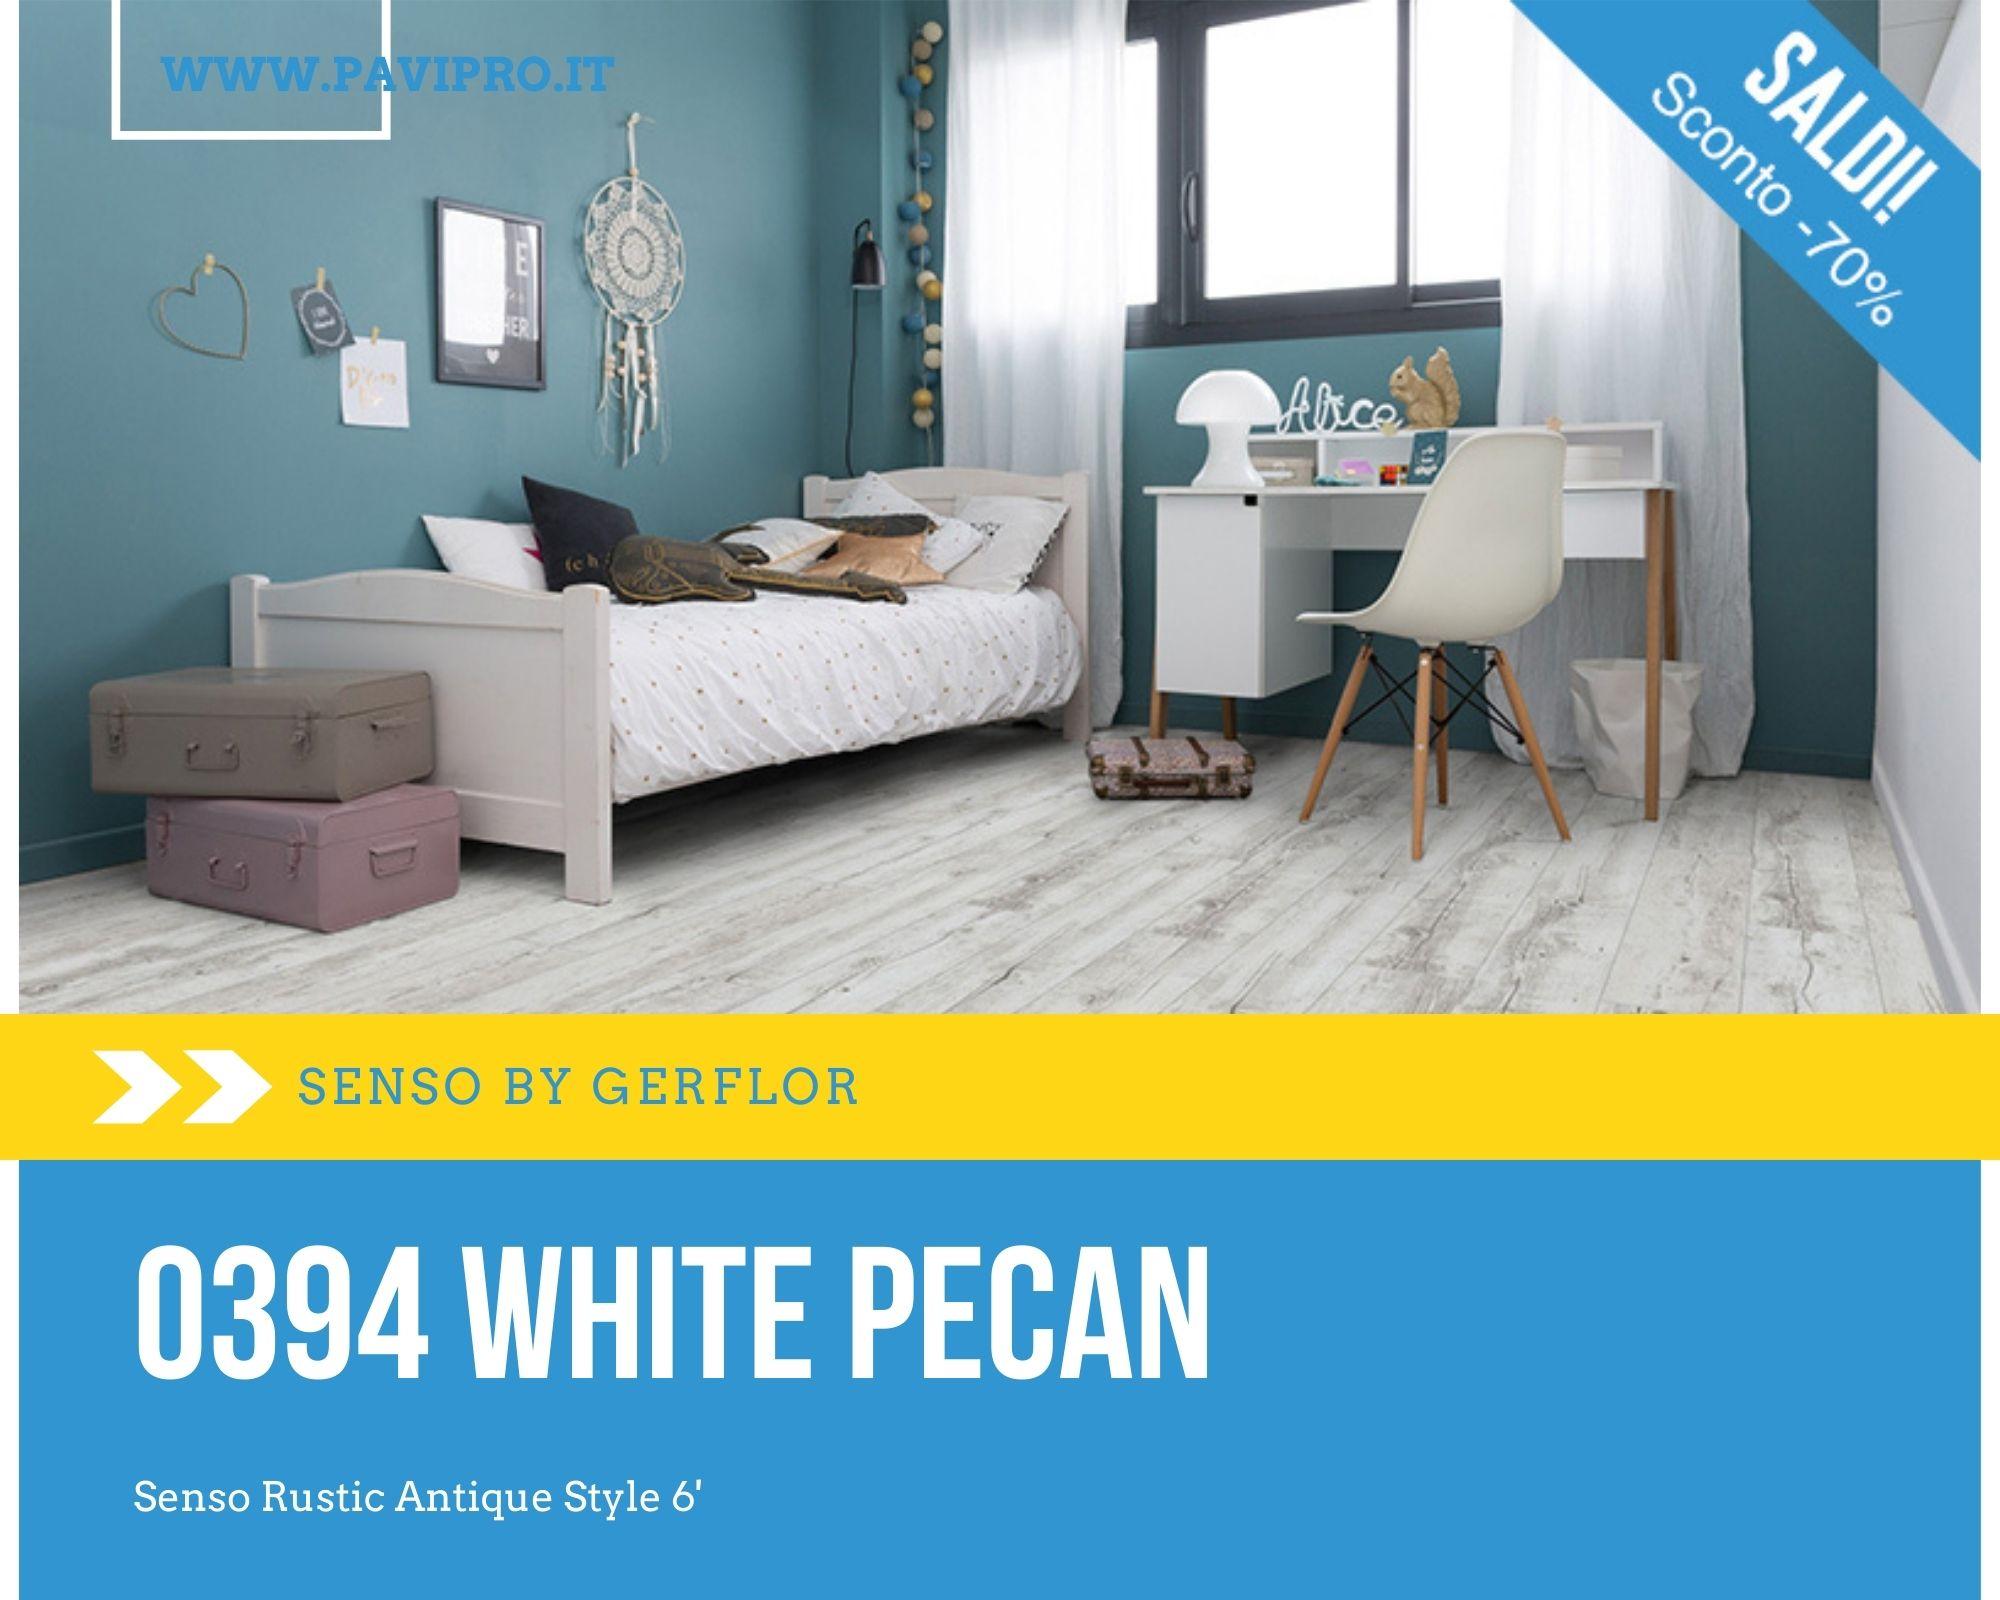 Senso by Gerflor – 0394 White Pecan